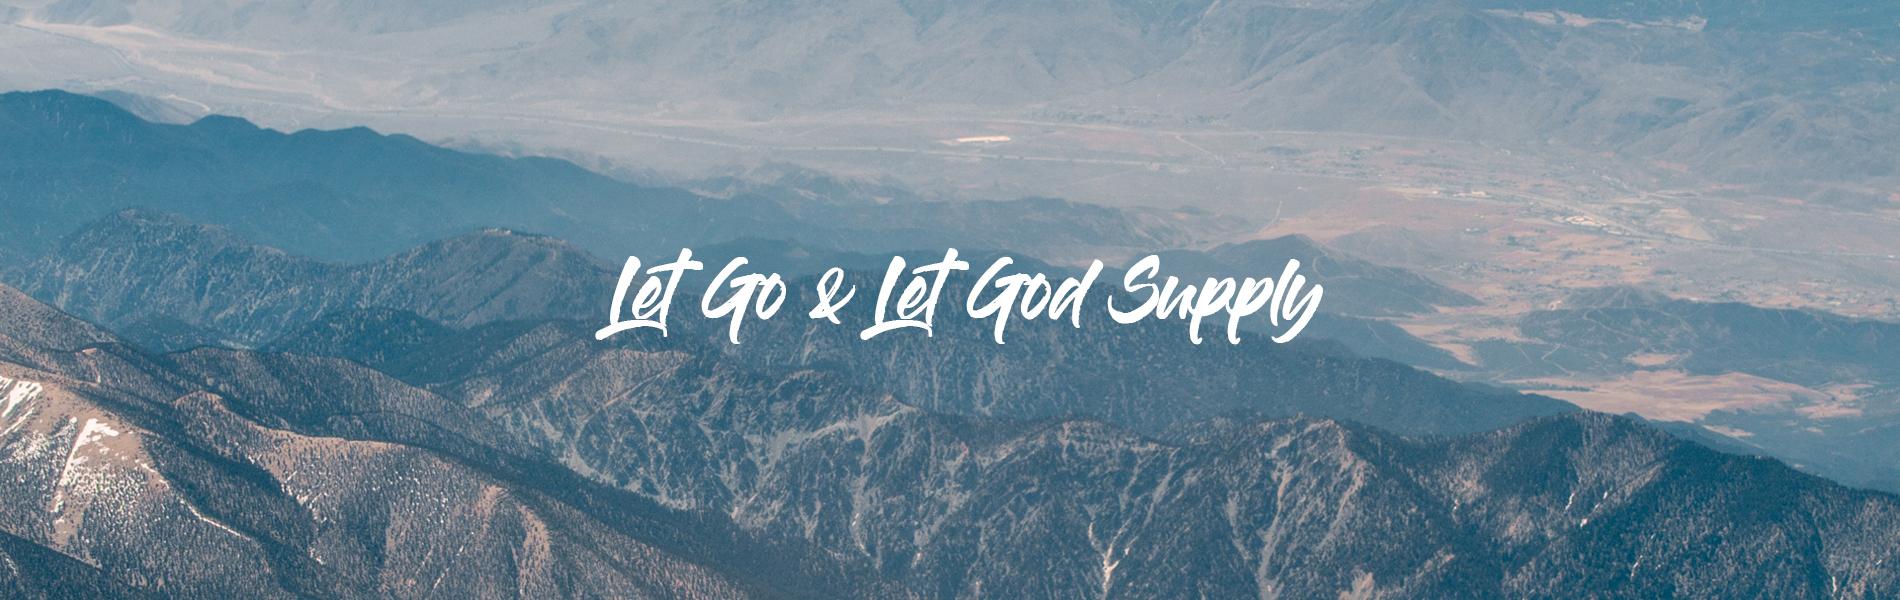 11-Nov_Let-Go--Let-God-Supply New Creation TV | Broadcasting the Gospel of Jesus